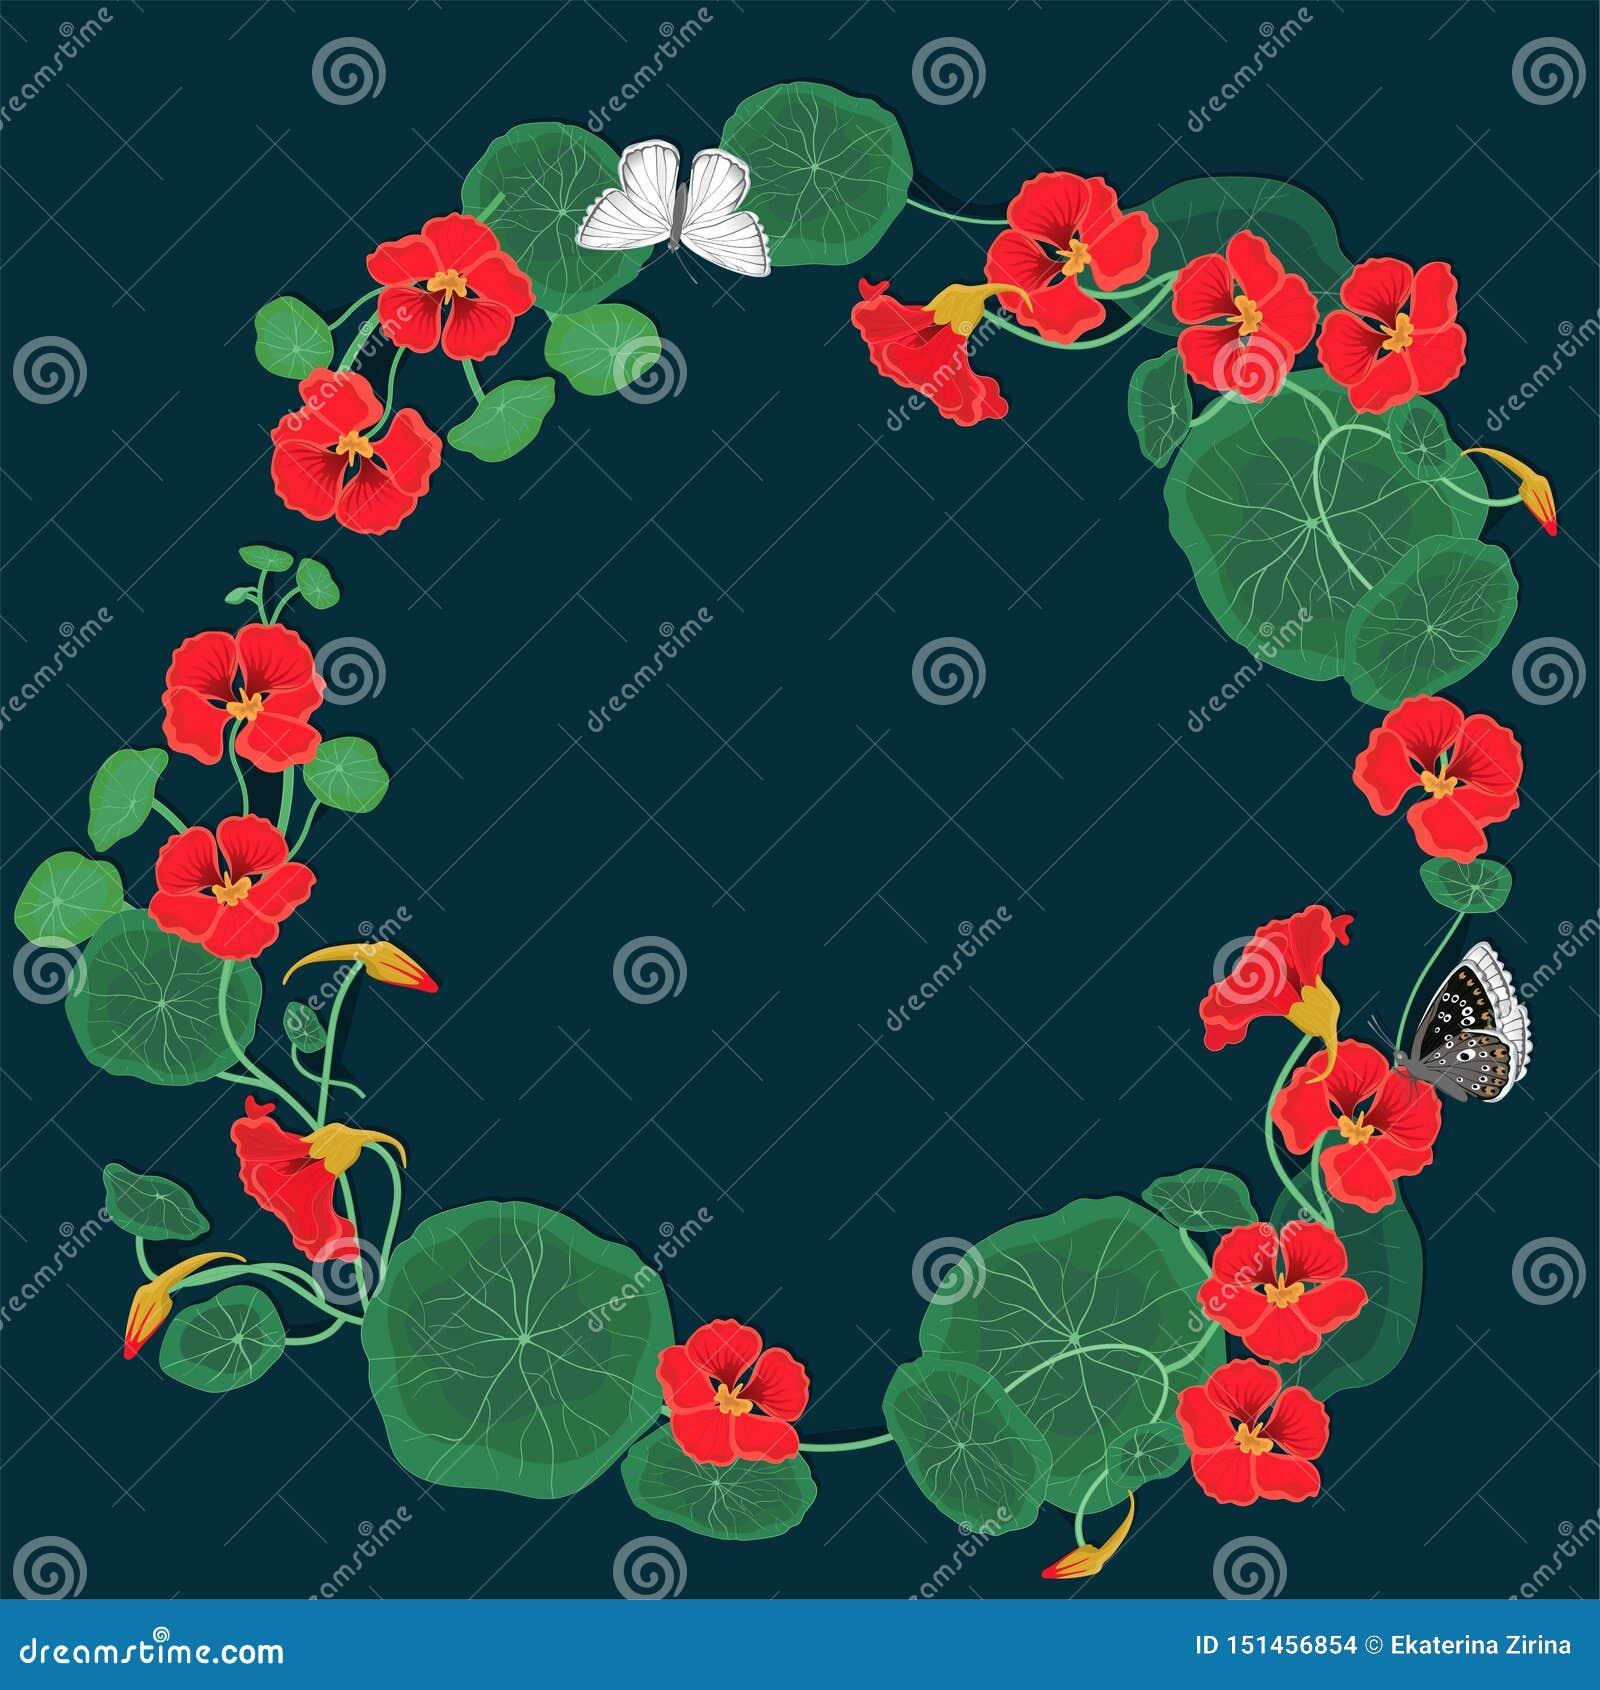 Round frame of nasturtium flowers with butterflies. Vector template